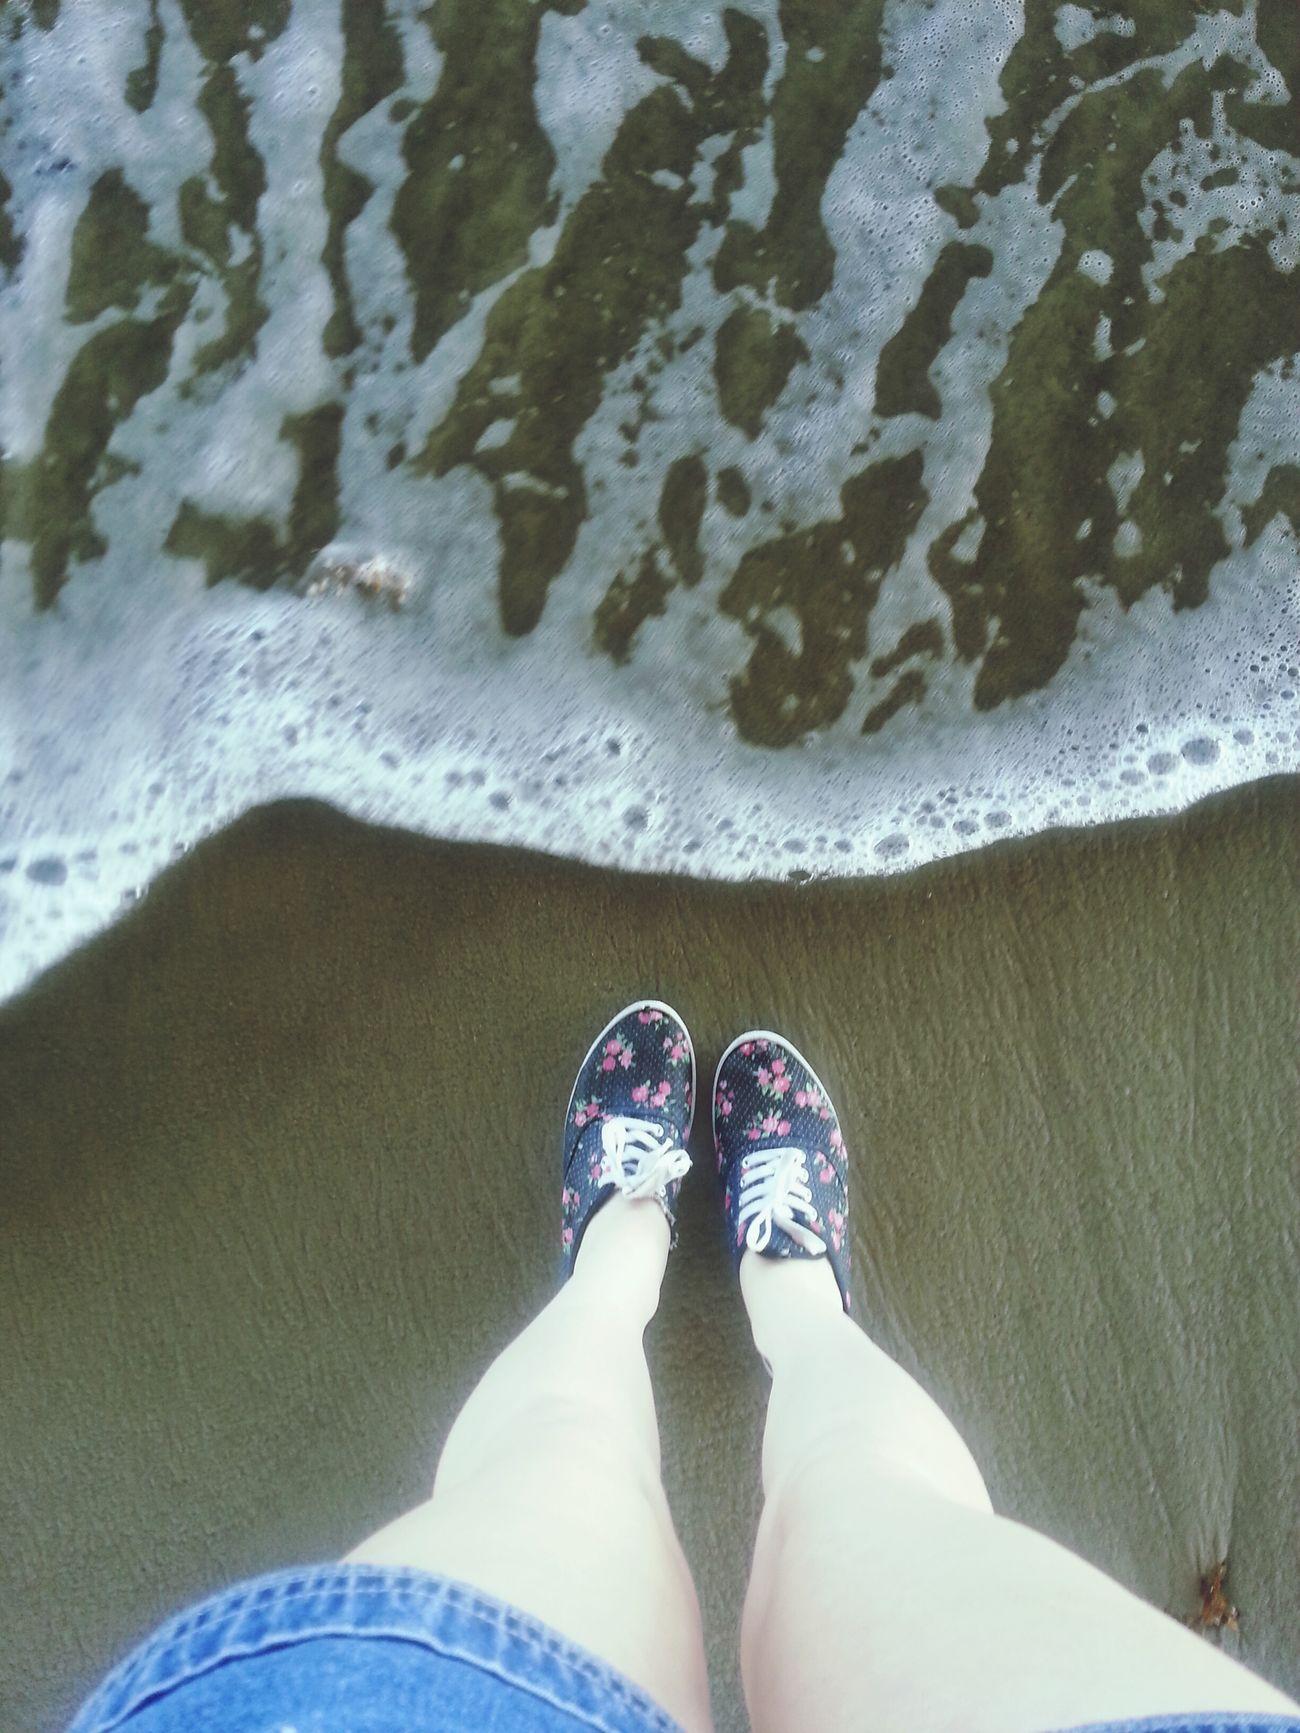 My white legs